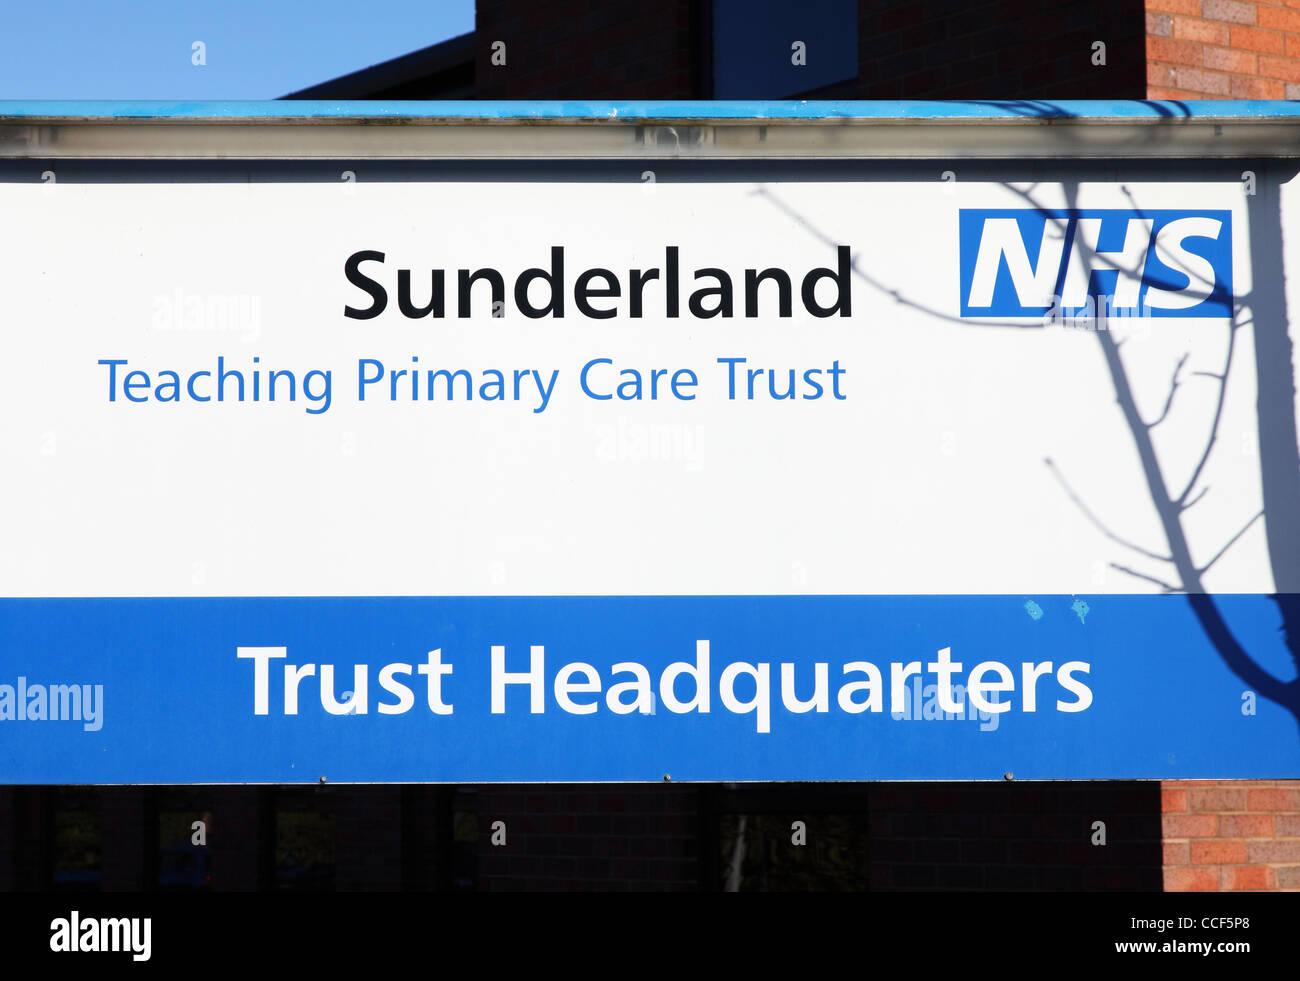 Sunderland Teaching Primary Care Trust NHS headquarters north east England UK - Stock Image